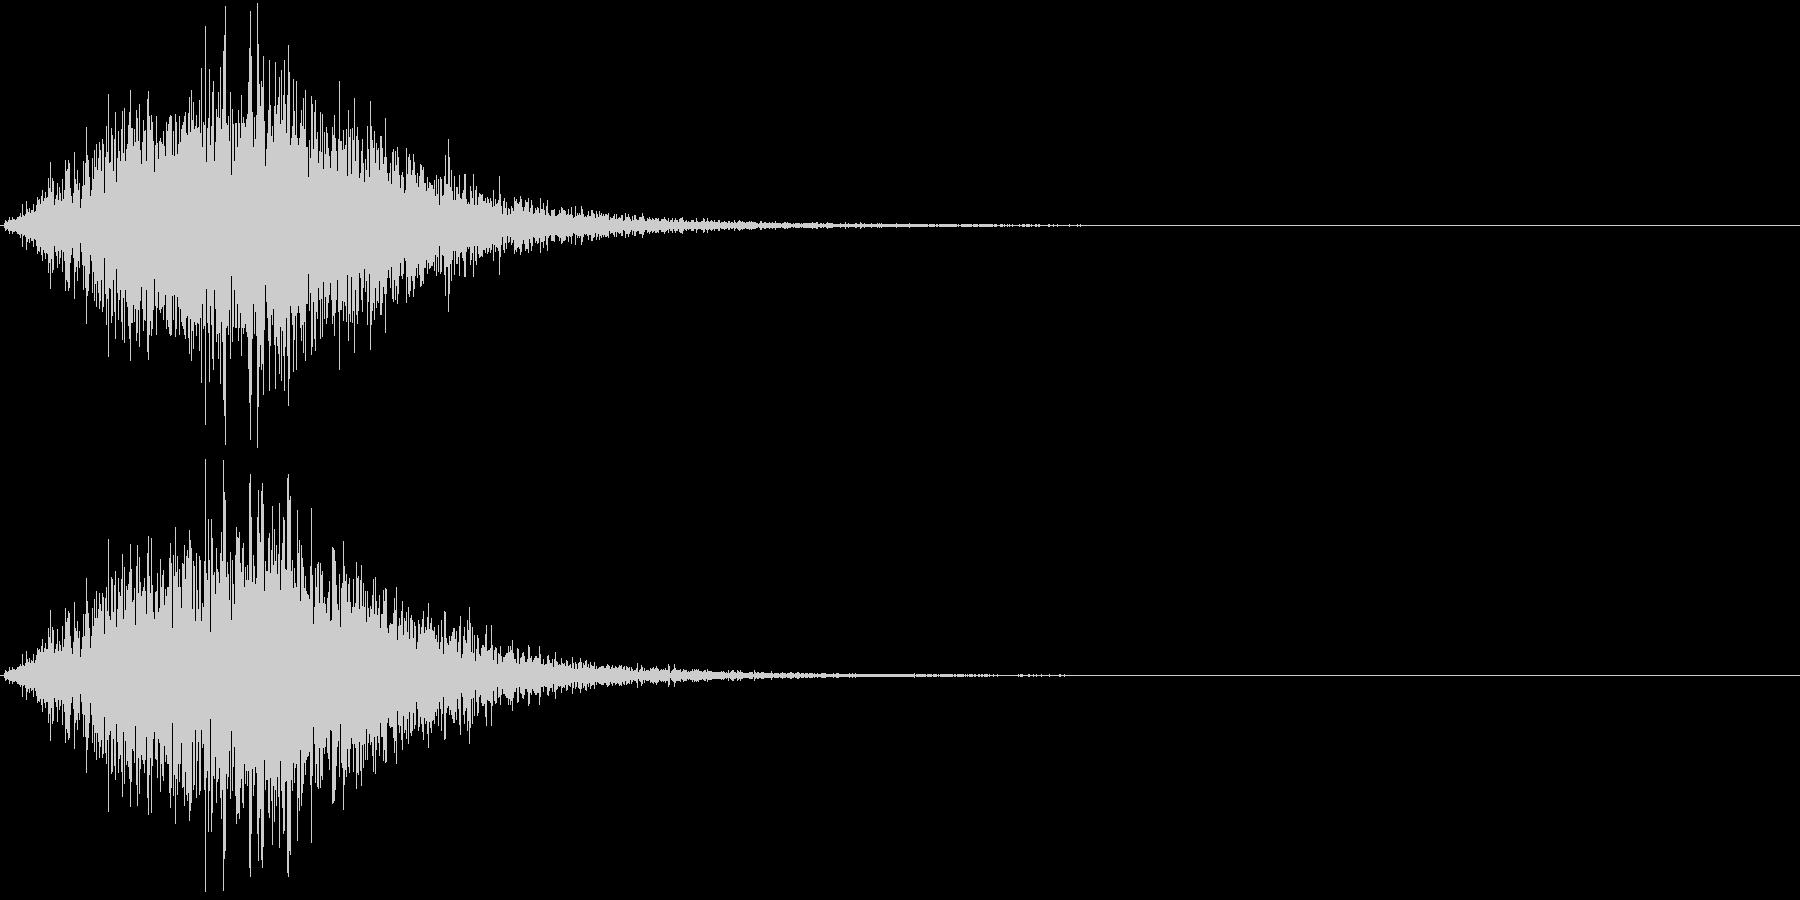 Battle 戦闘エフェクト音 10の未再生の波形